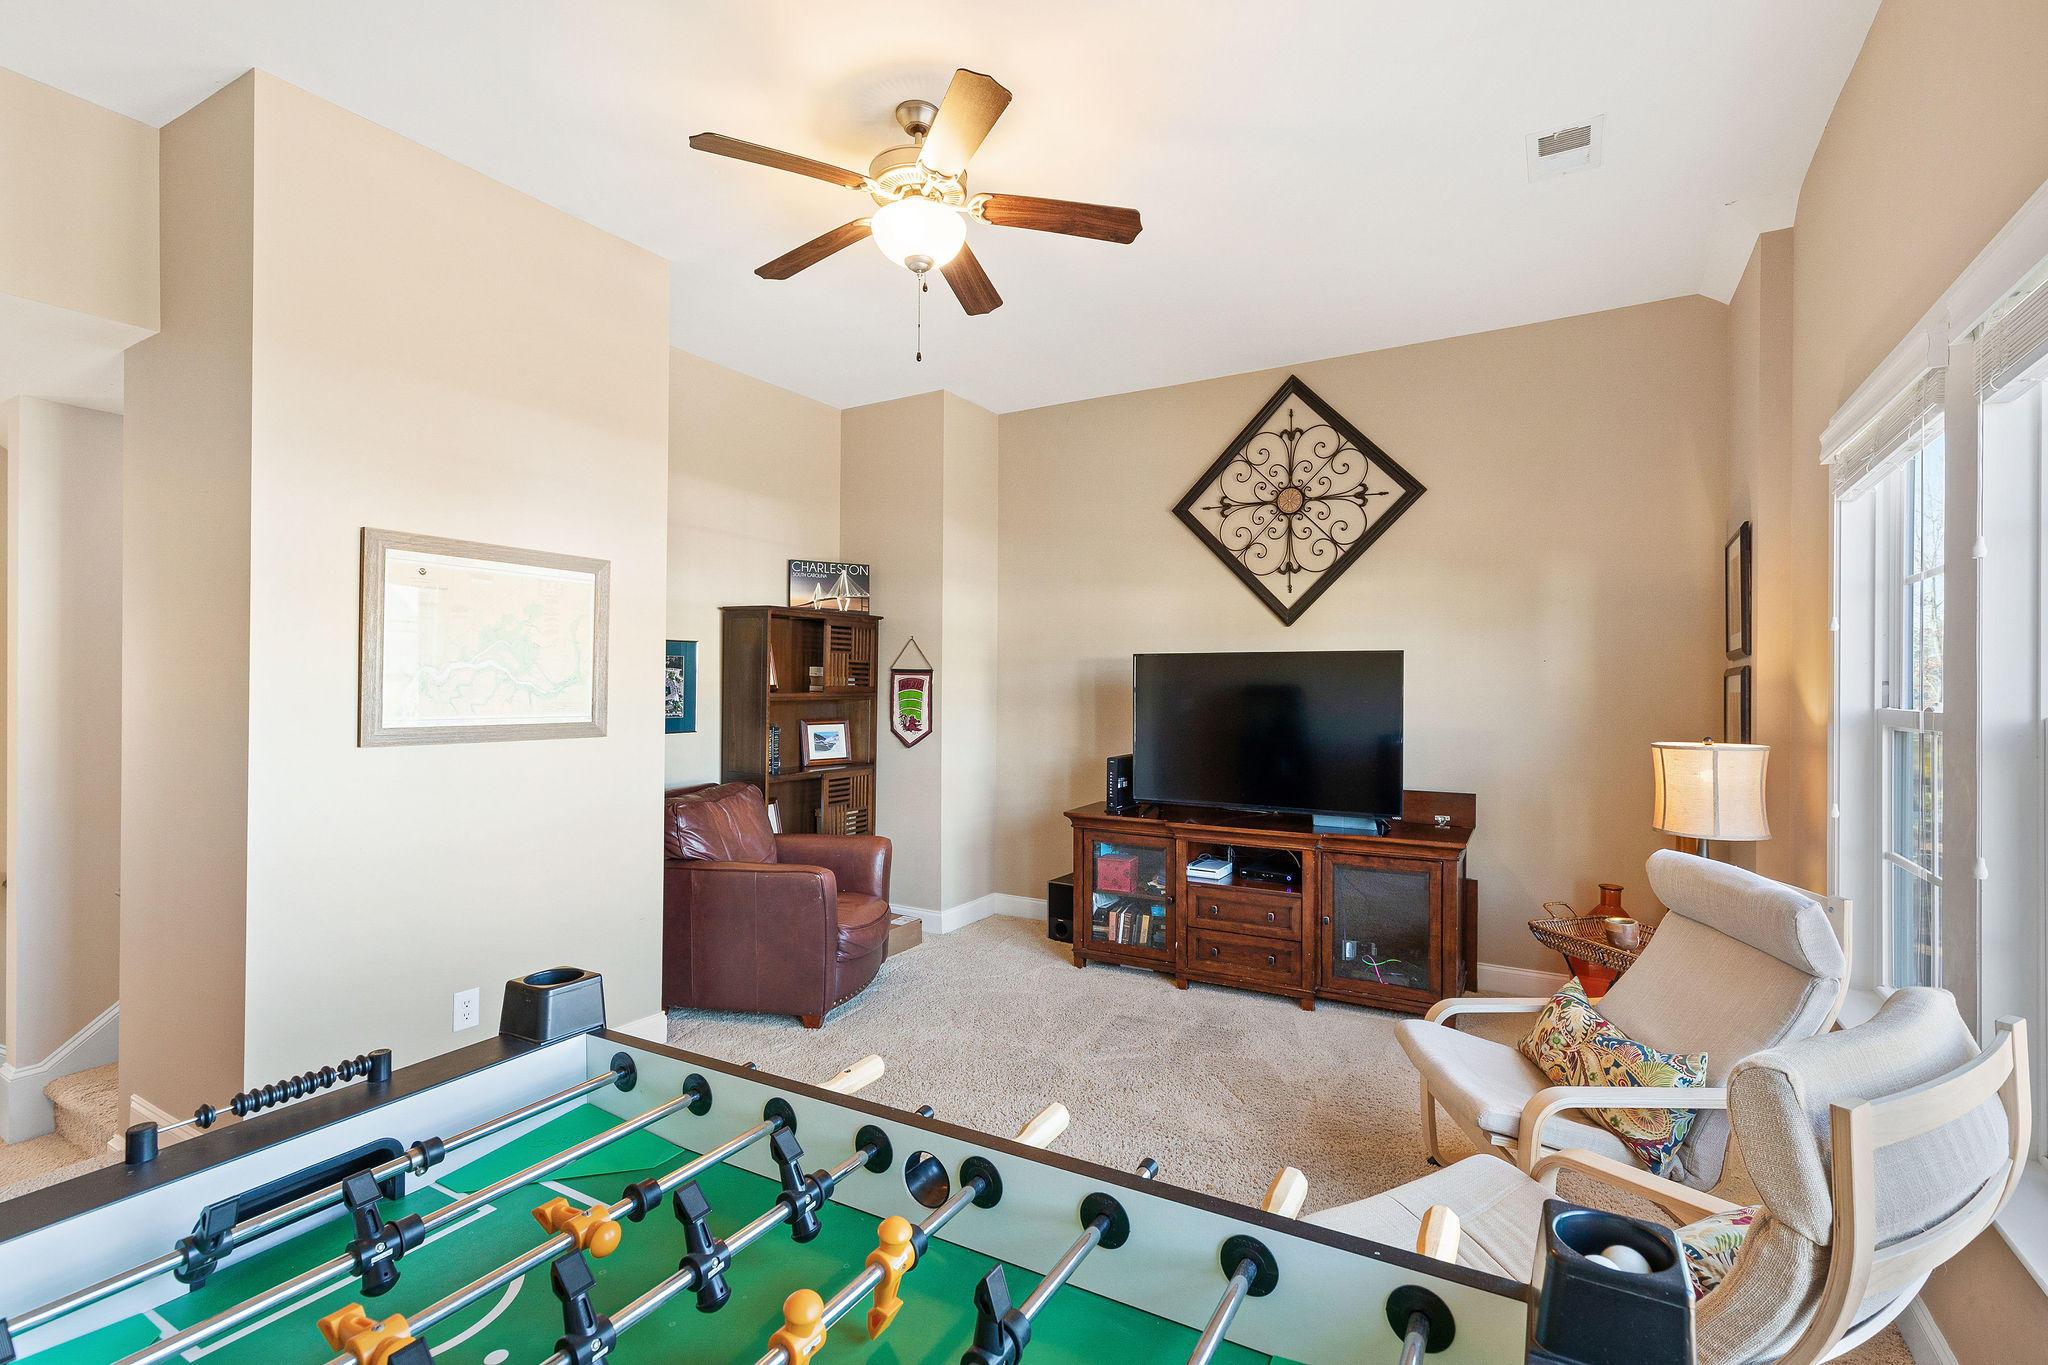 Dunes West Homes For Sale - 3212 Hatchway, Mount Pleasant, SC - 5